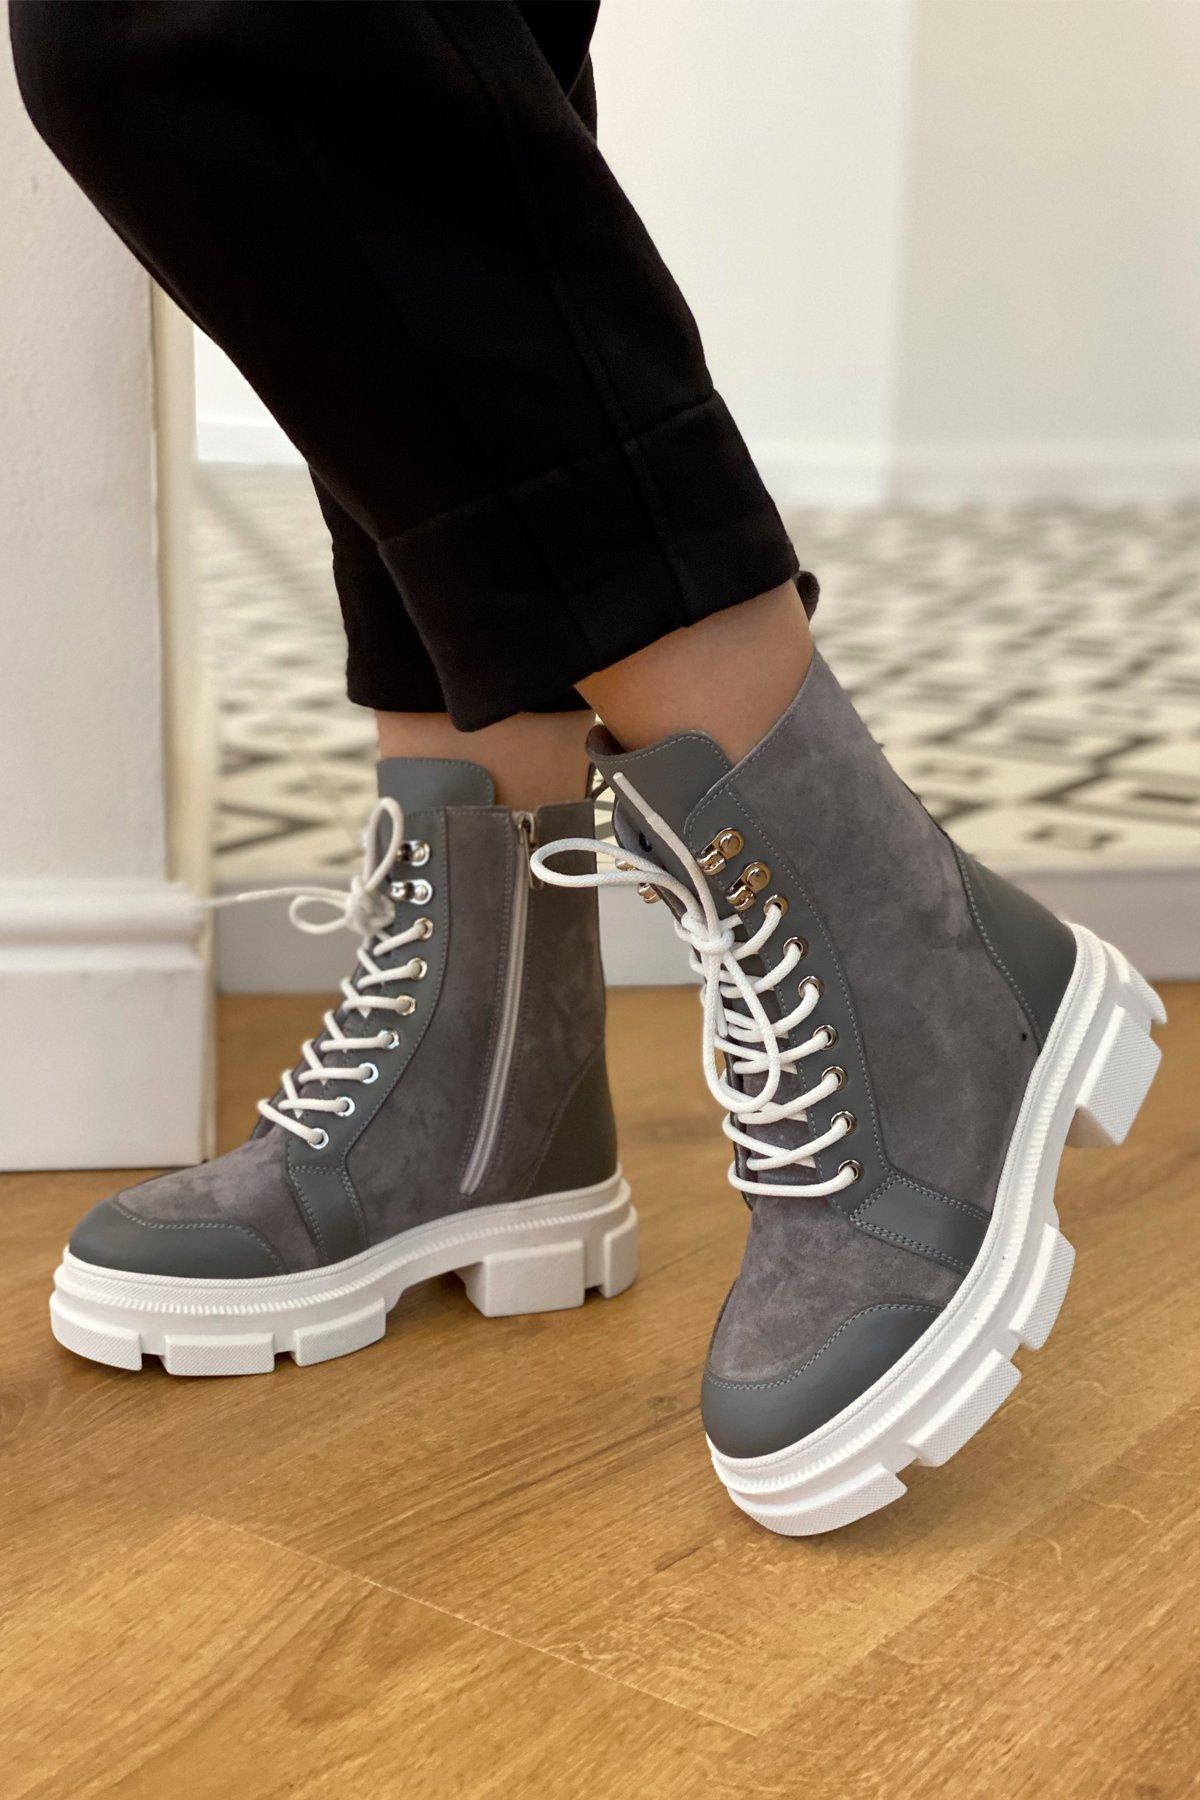 Ботинки зимние 260/14 (замш,вставки кожа,на шнурках) АРТ. 46440 Цвет: Серый - фото 1, интернет магазин tm-modus.ru